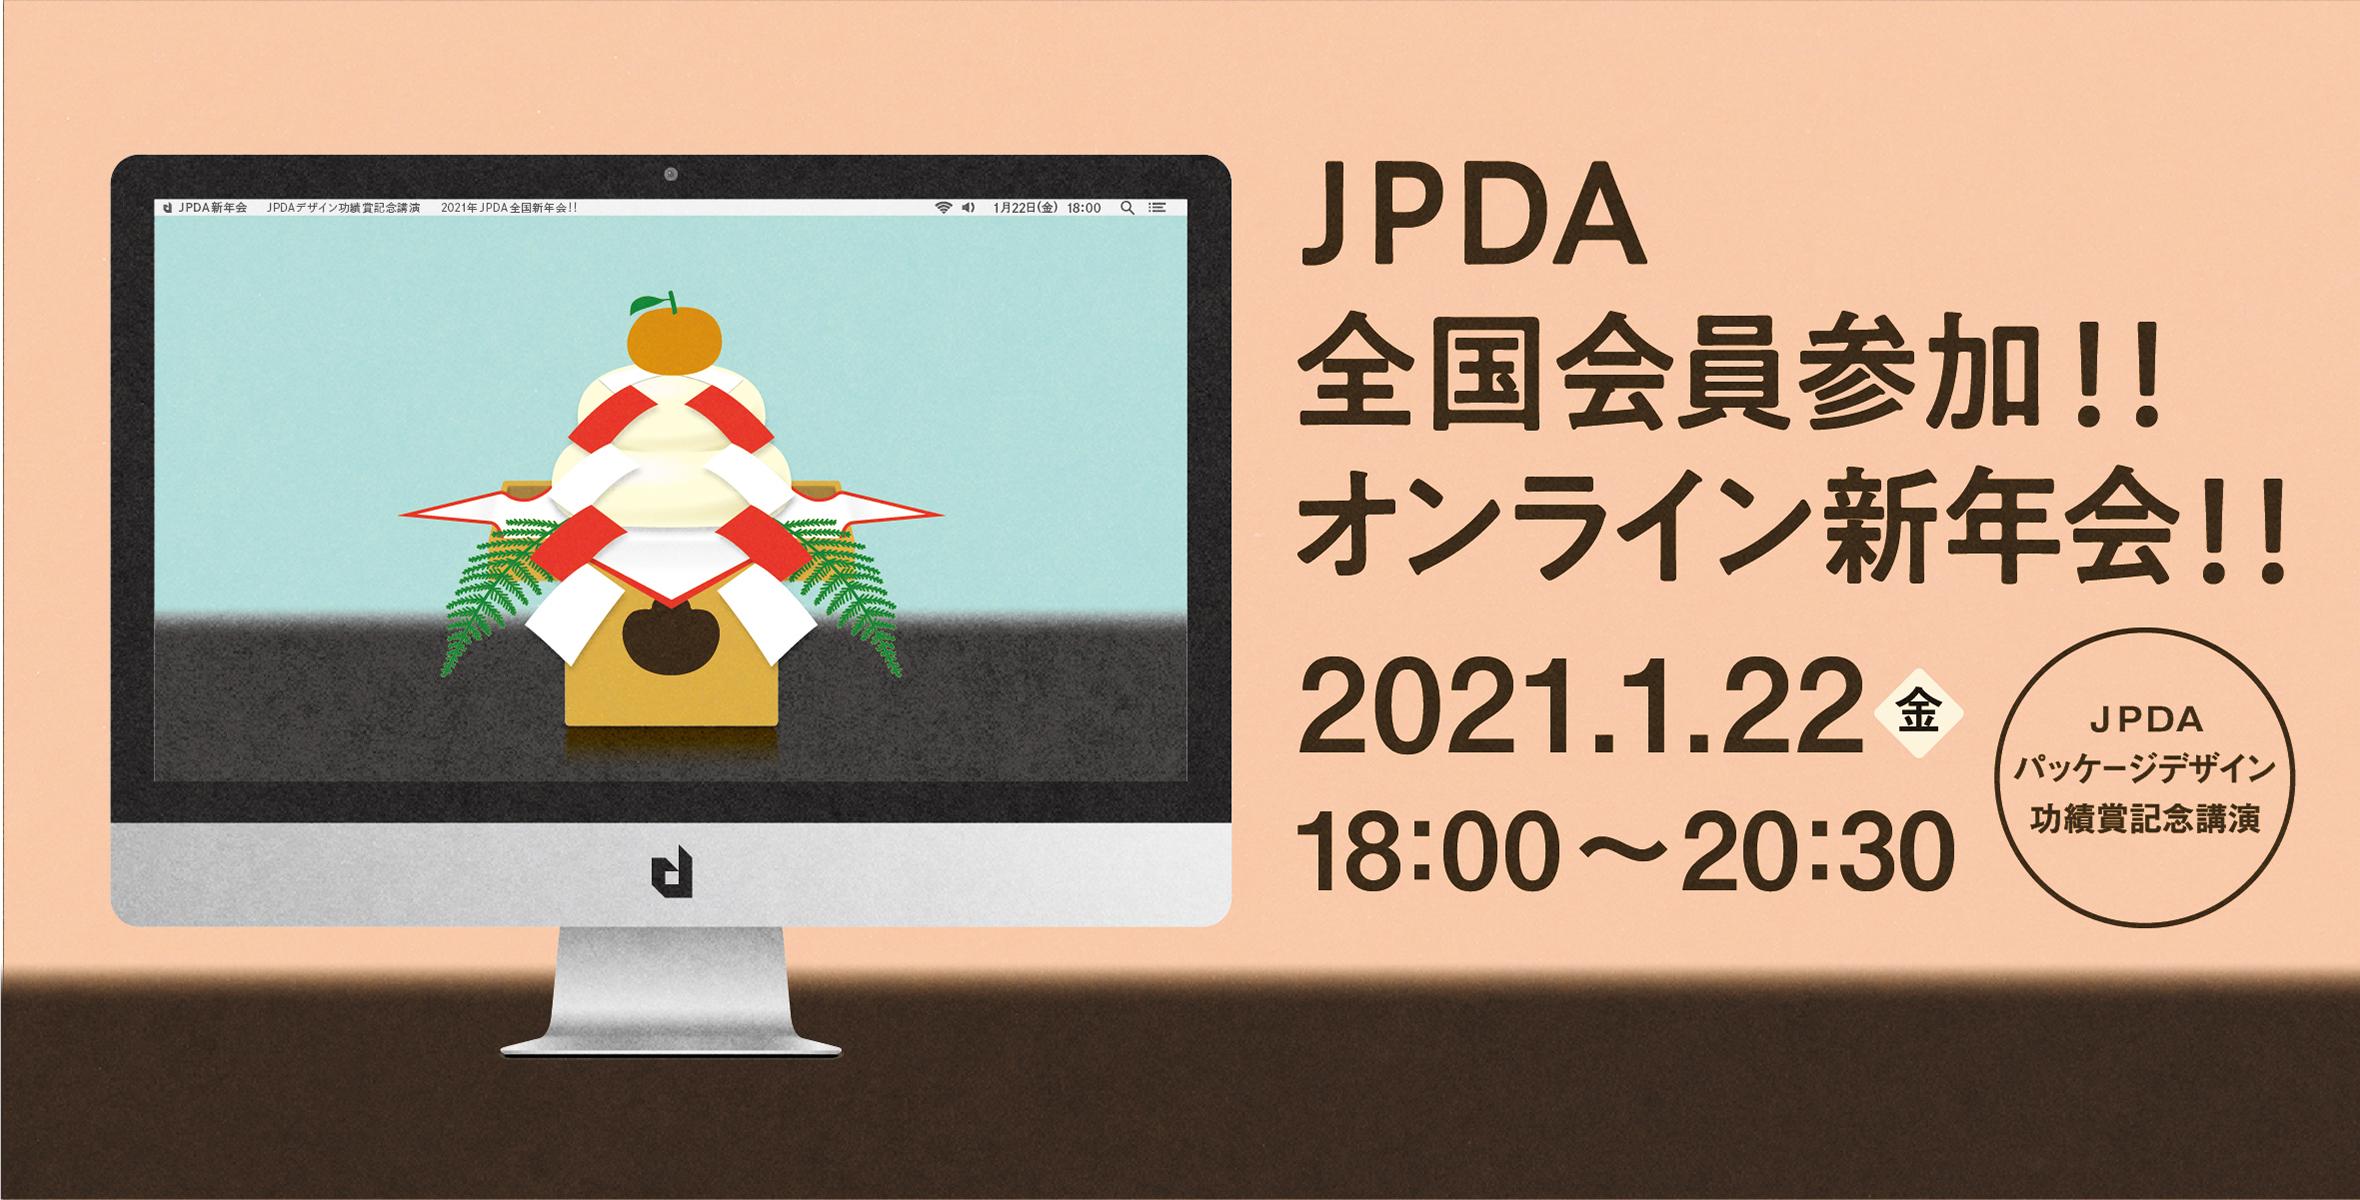 JPDAオンライン新年会のイメージ